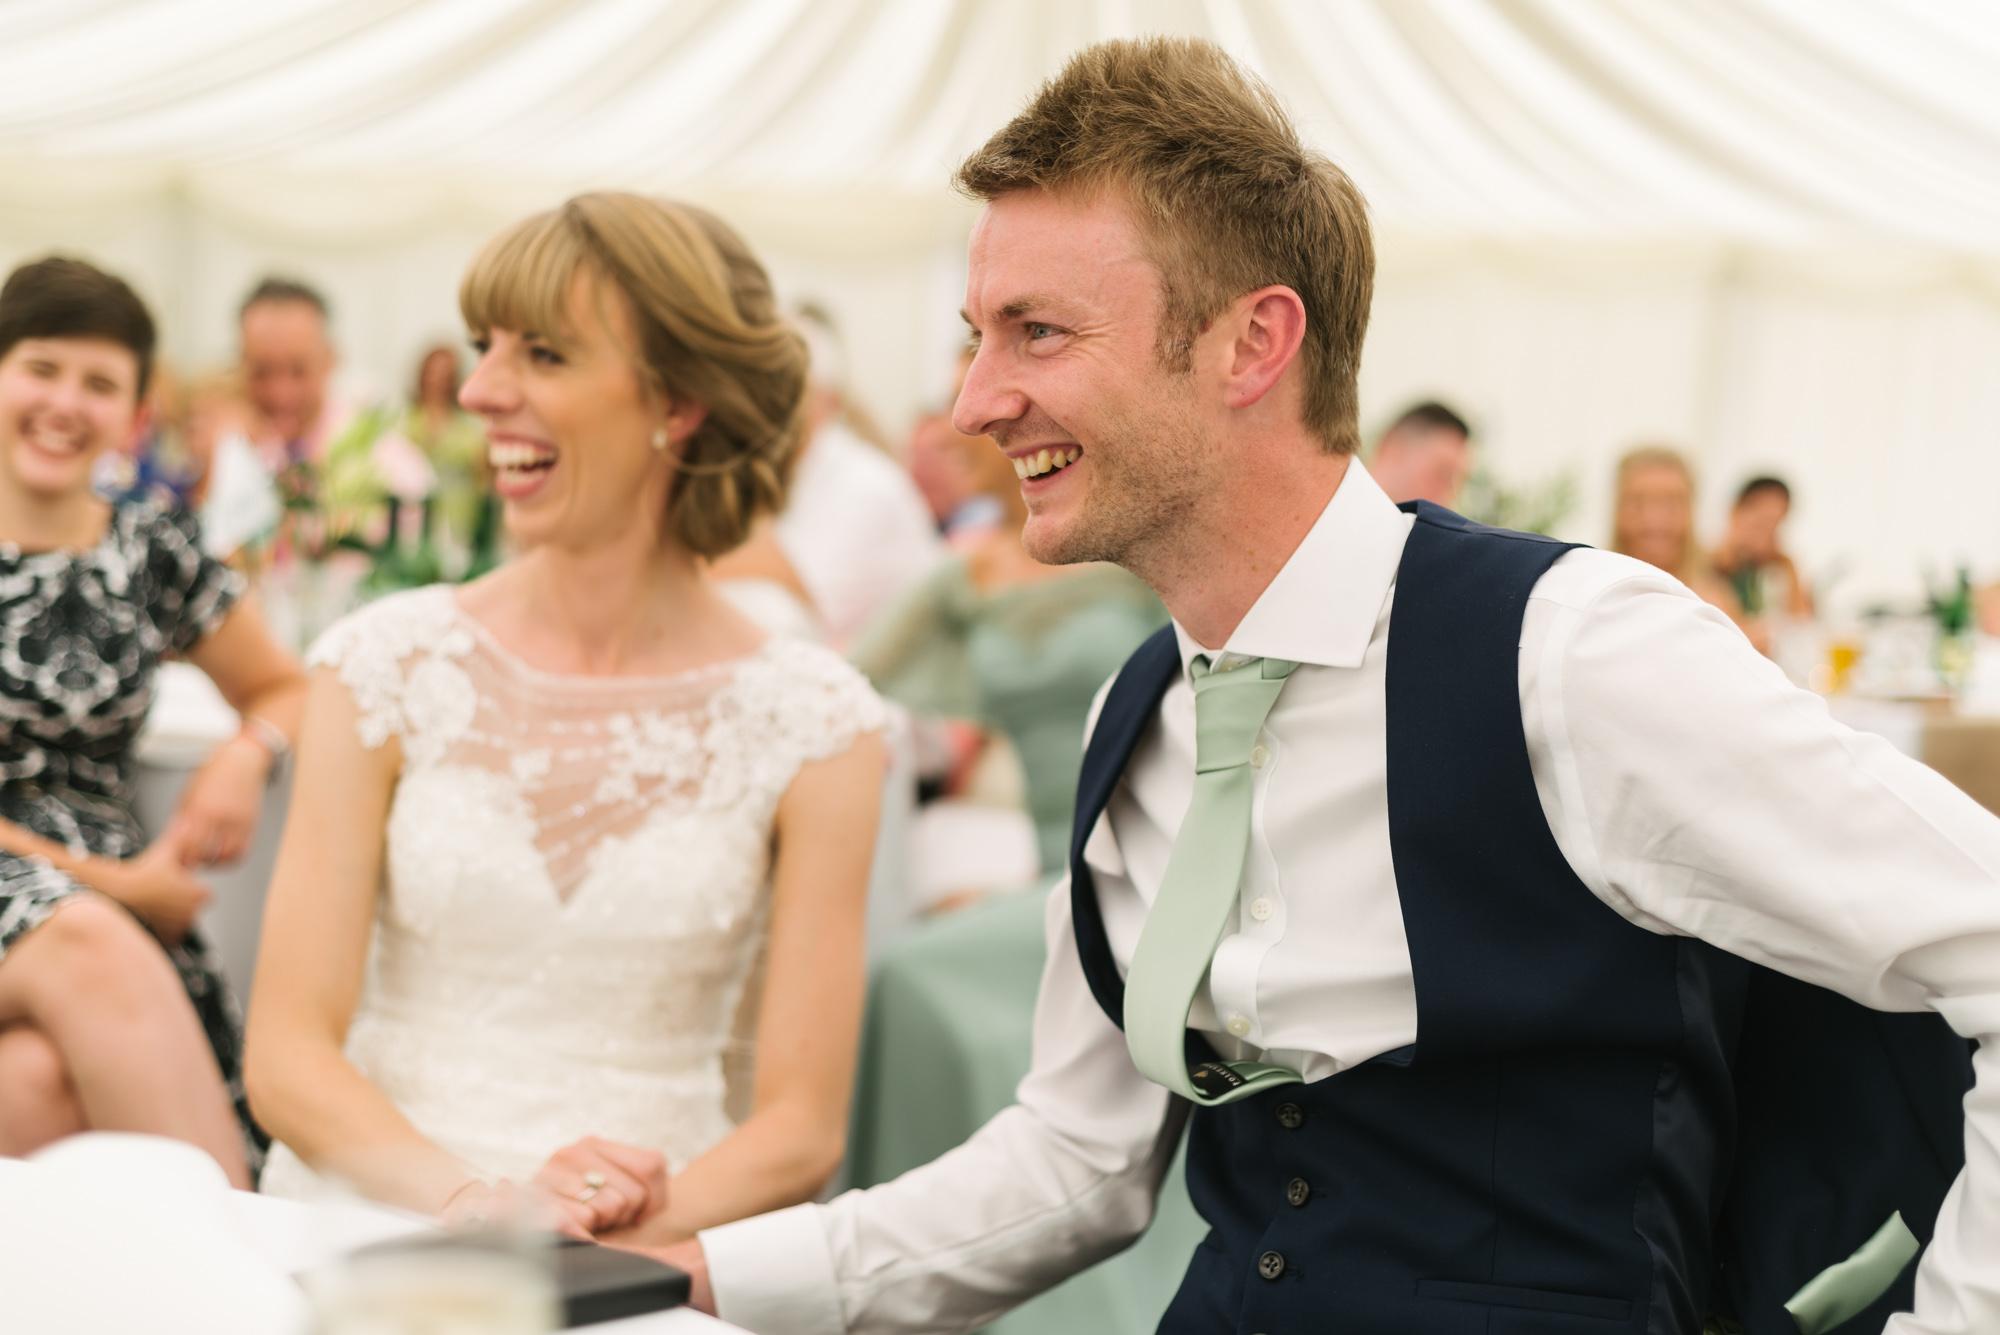 Cricket Club Wedding Tea Party Eversholt Bedfordshire-58